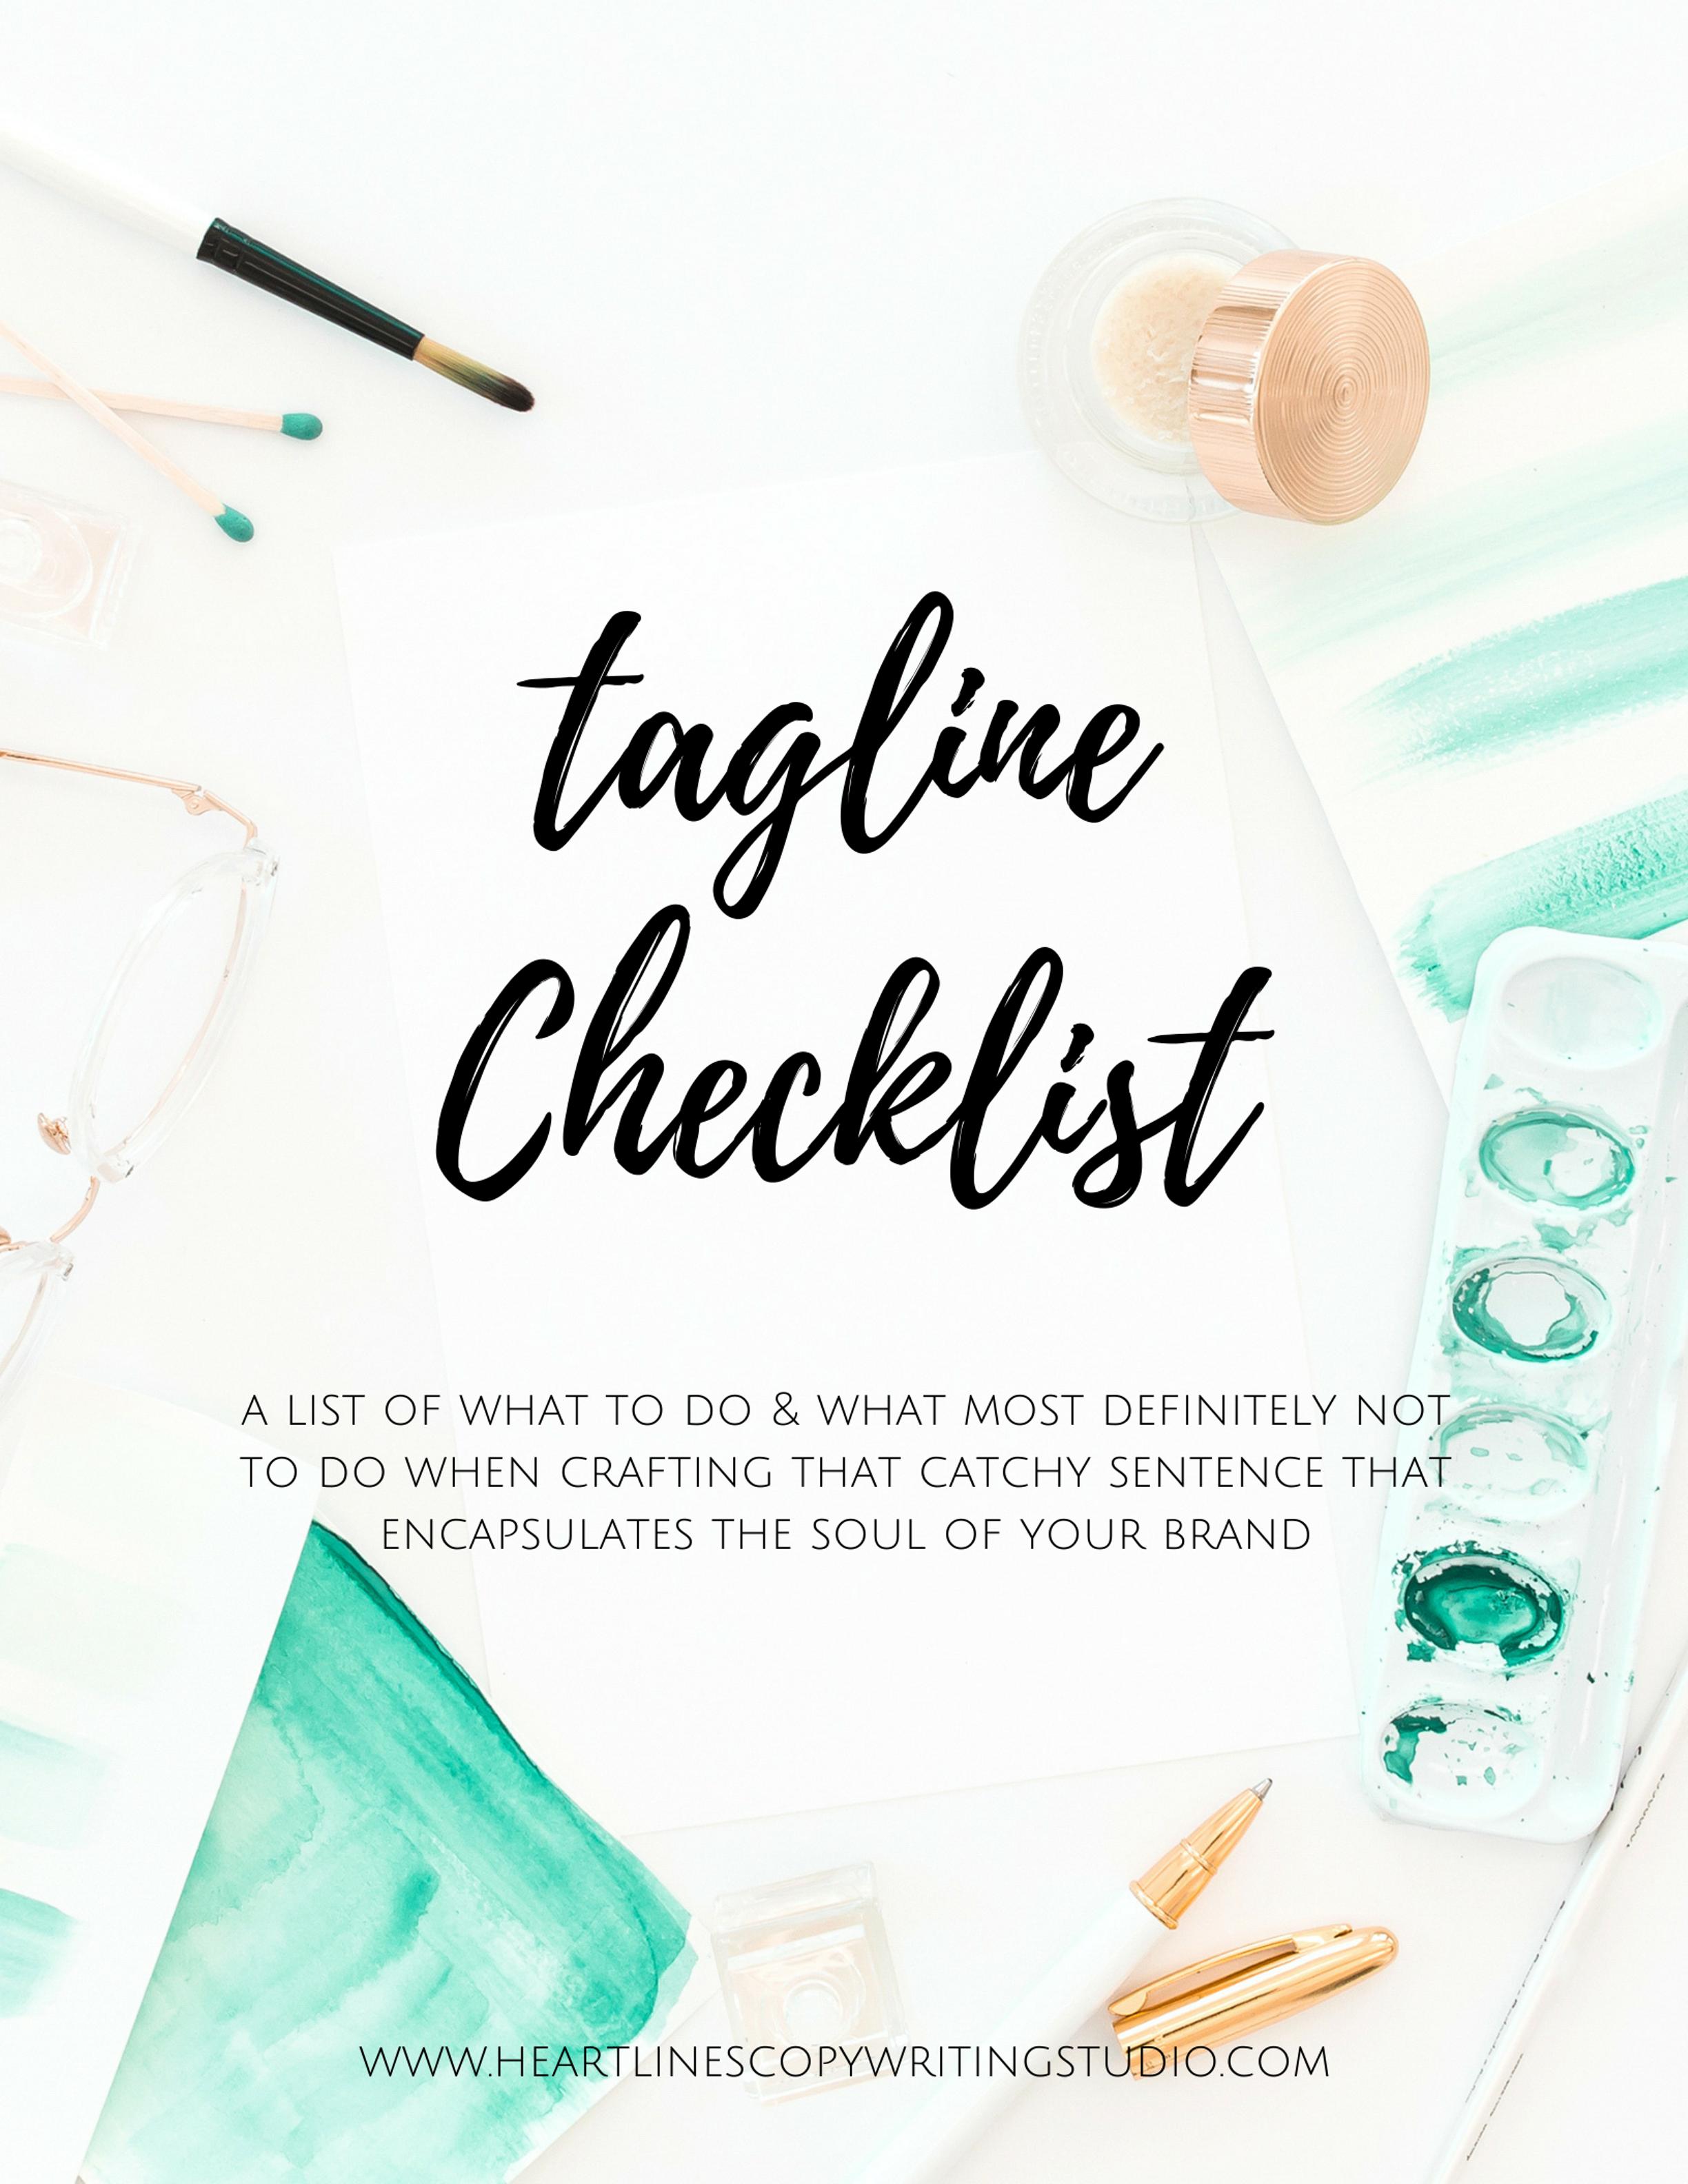 tagline checklist.png